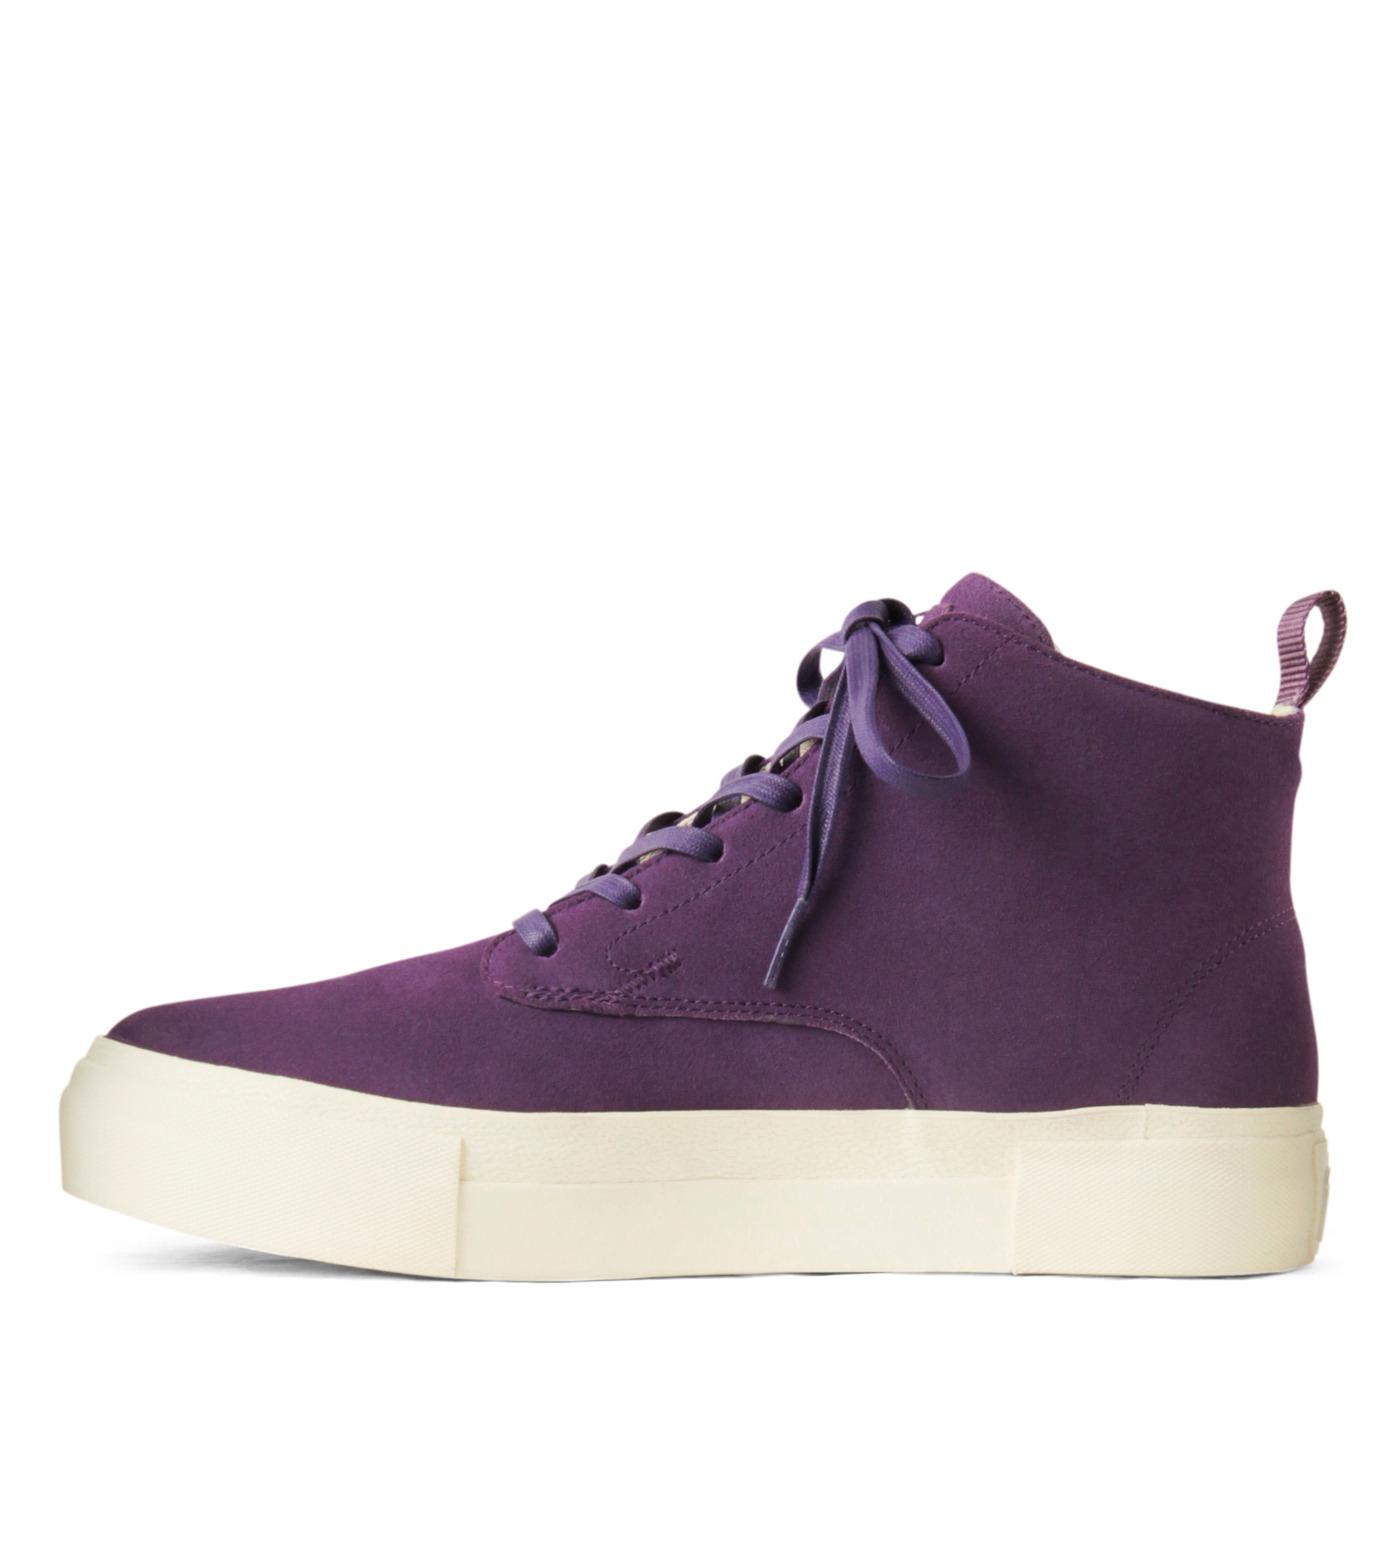 Eytys(エイティーズ)のSuedeHicutSneaker-PURPLE(スニーカー/sneaker)-ODYSSEY-SUE-82 拡大詳細画像2